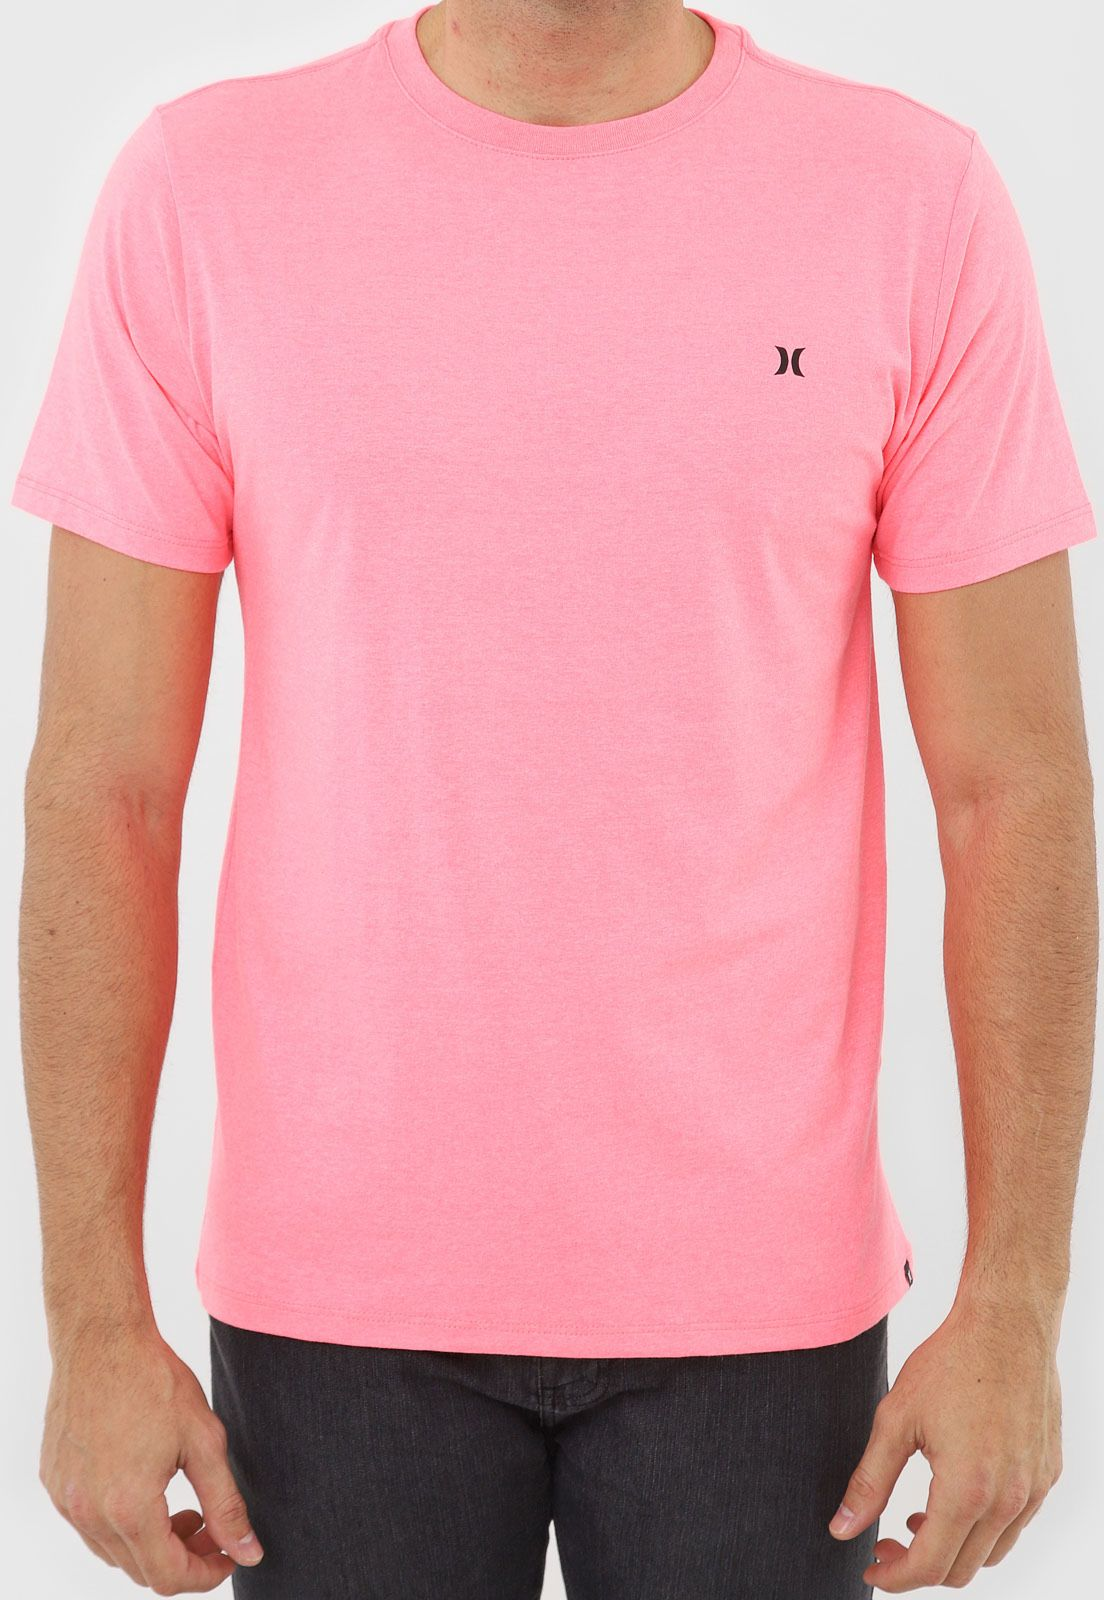 Camiseta Hurley Rosa